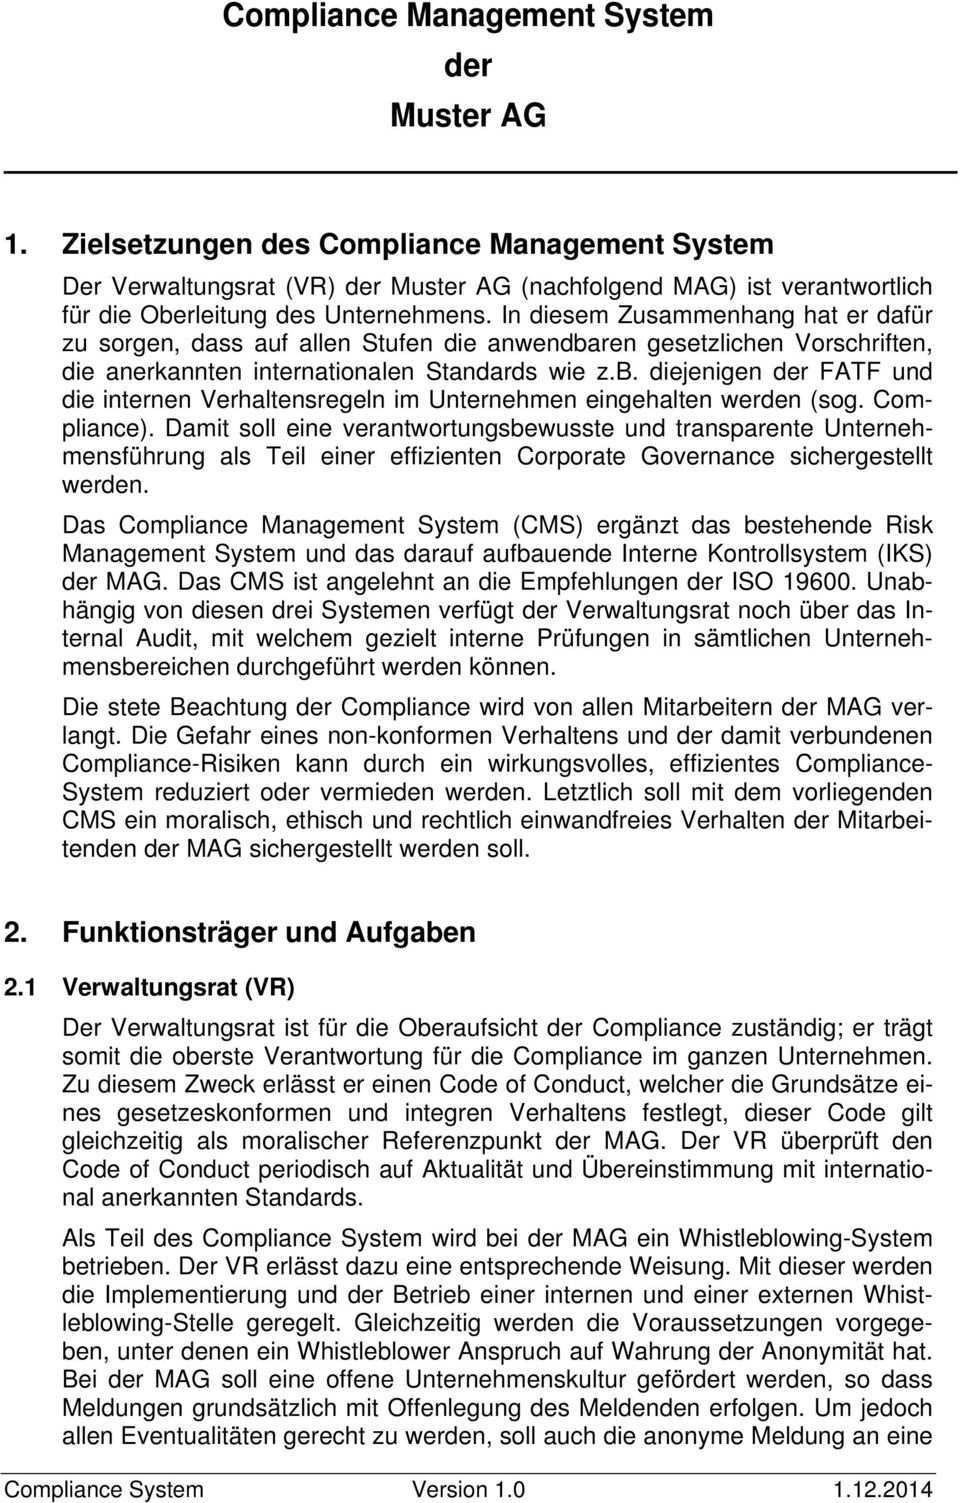 Compliance Management System Der Muster Ag Pdf Free Download